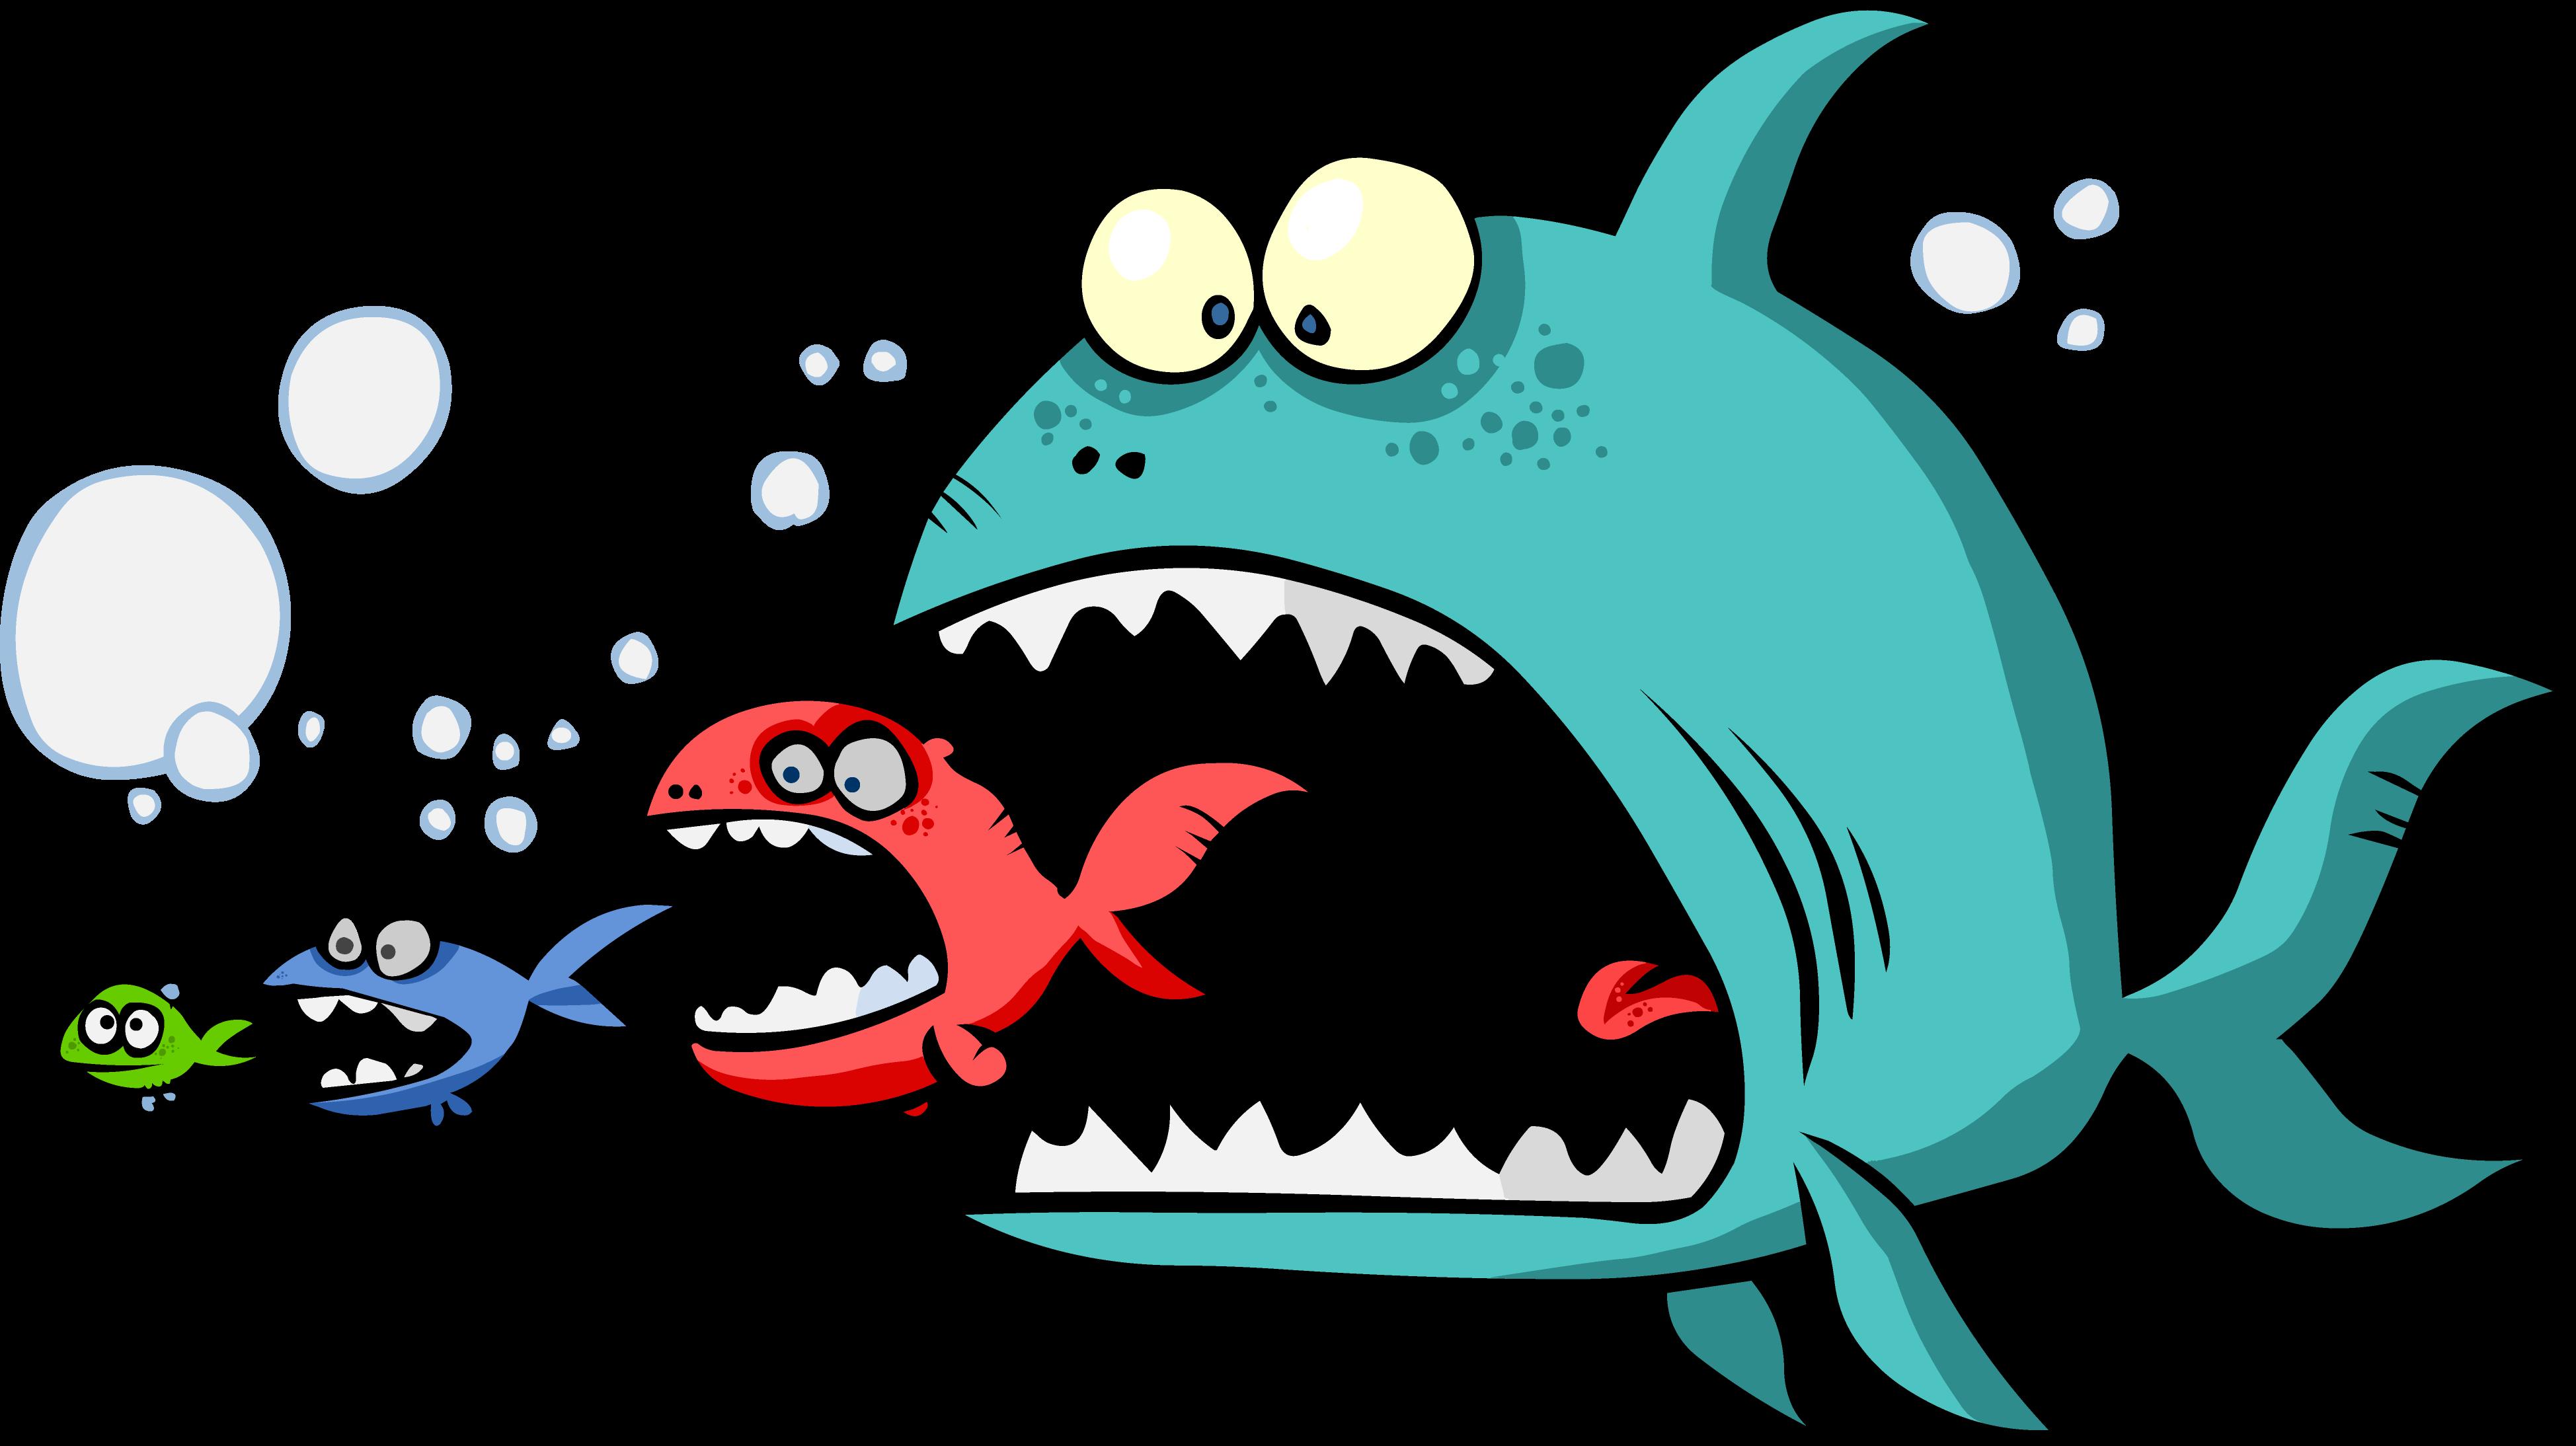 Fish you can eat clipart clip transparent Fish Eating Clip art - Fishing 3897*2188 transprent Png Free ... clip transparent